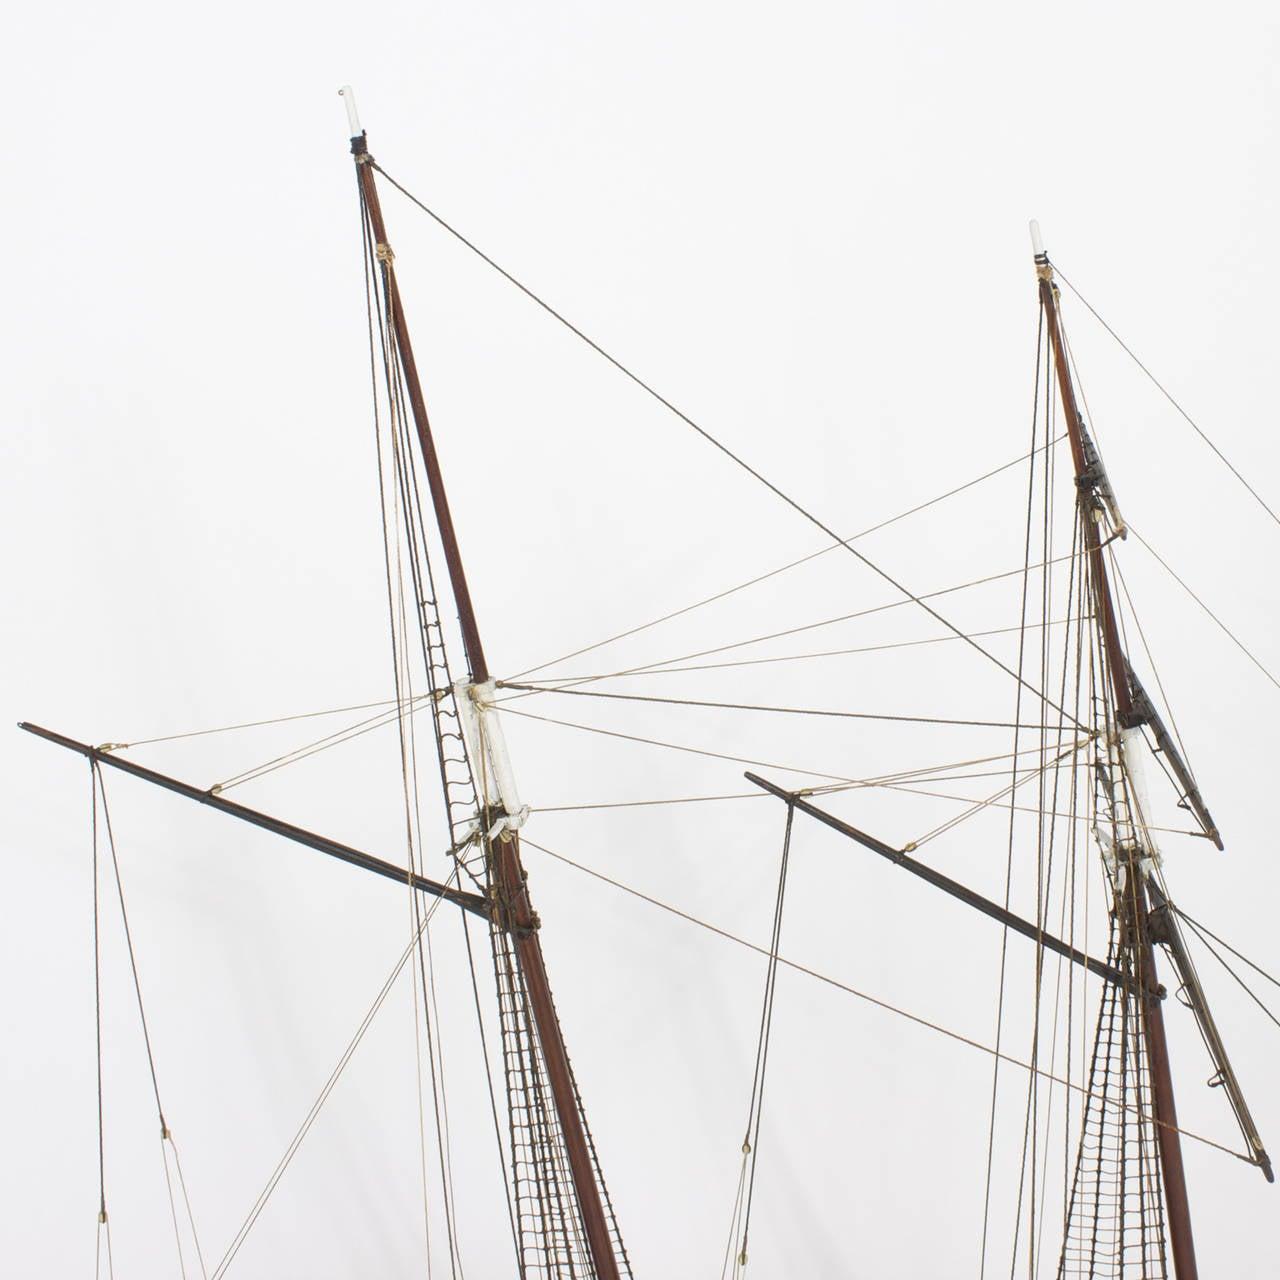 Mahogany Schooner Ship or Boat Model For Sale 2